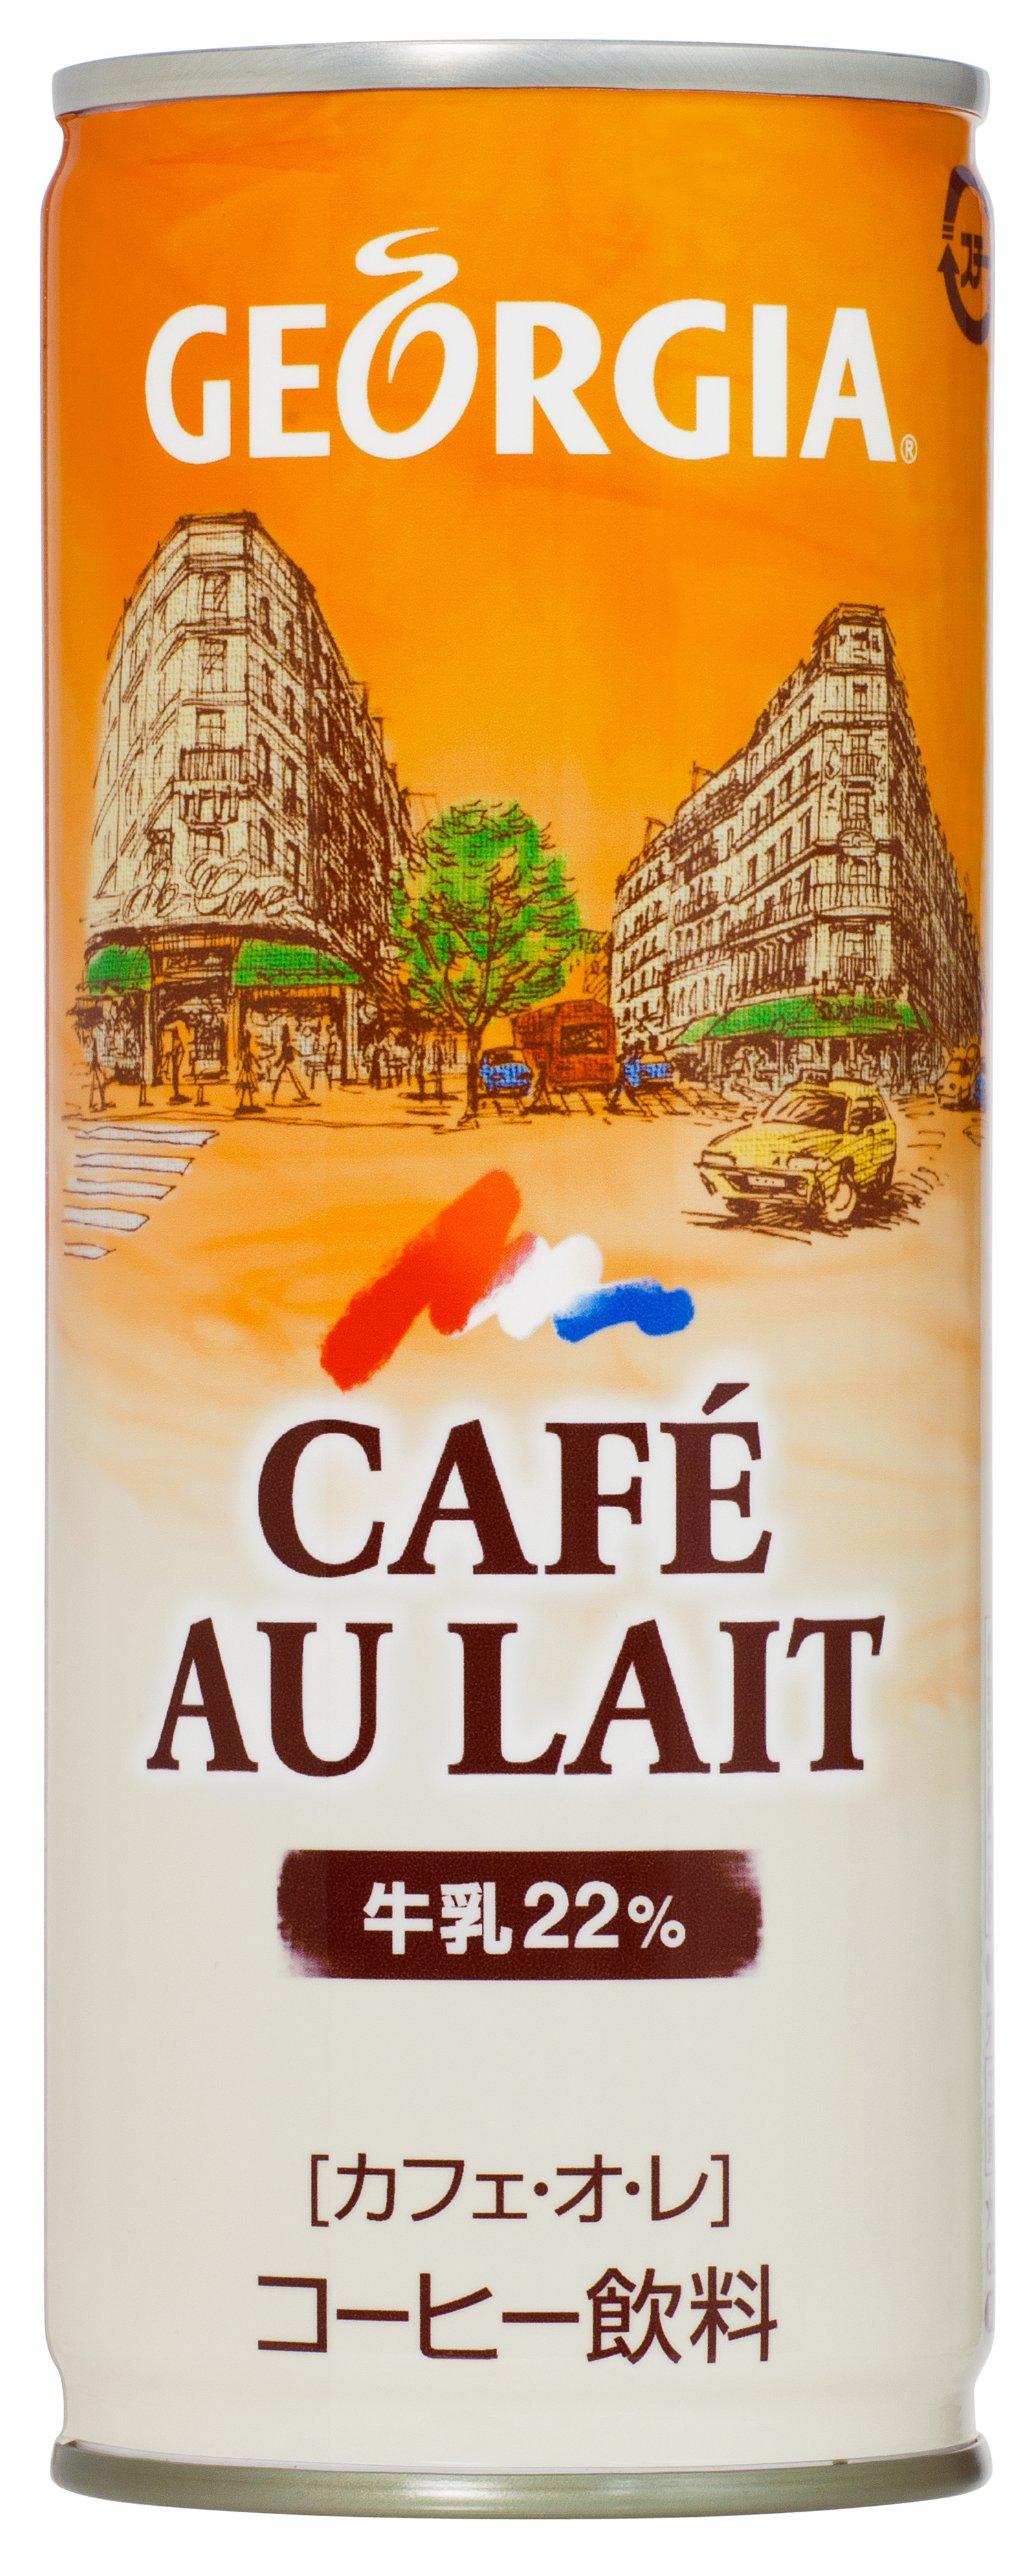 Georgia Coffee - Café Au Lait (Canned Japanese Coffee) 30 Can Box